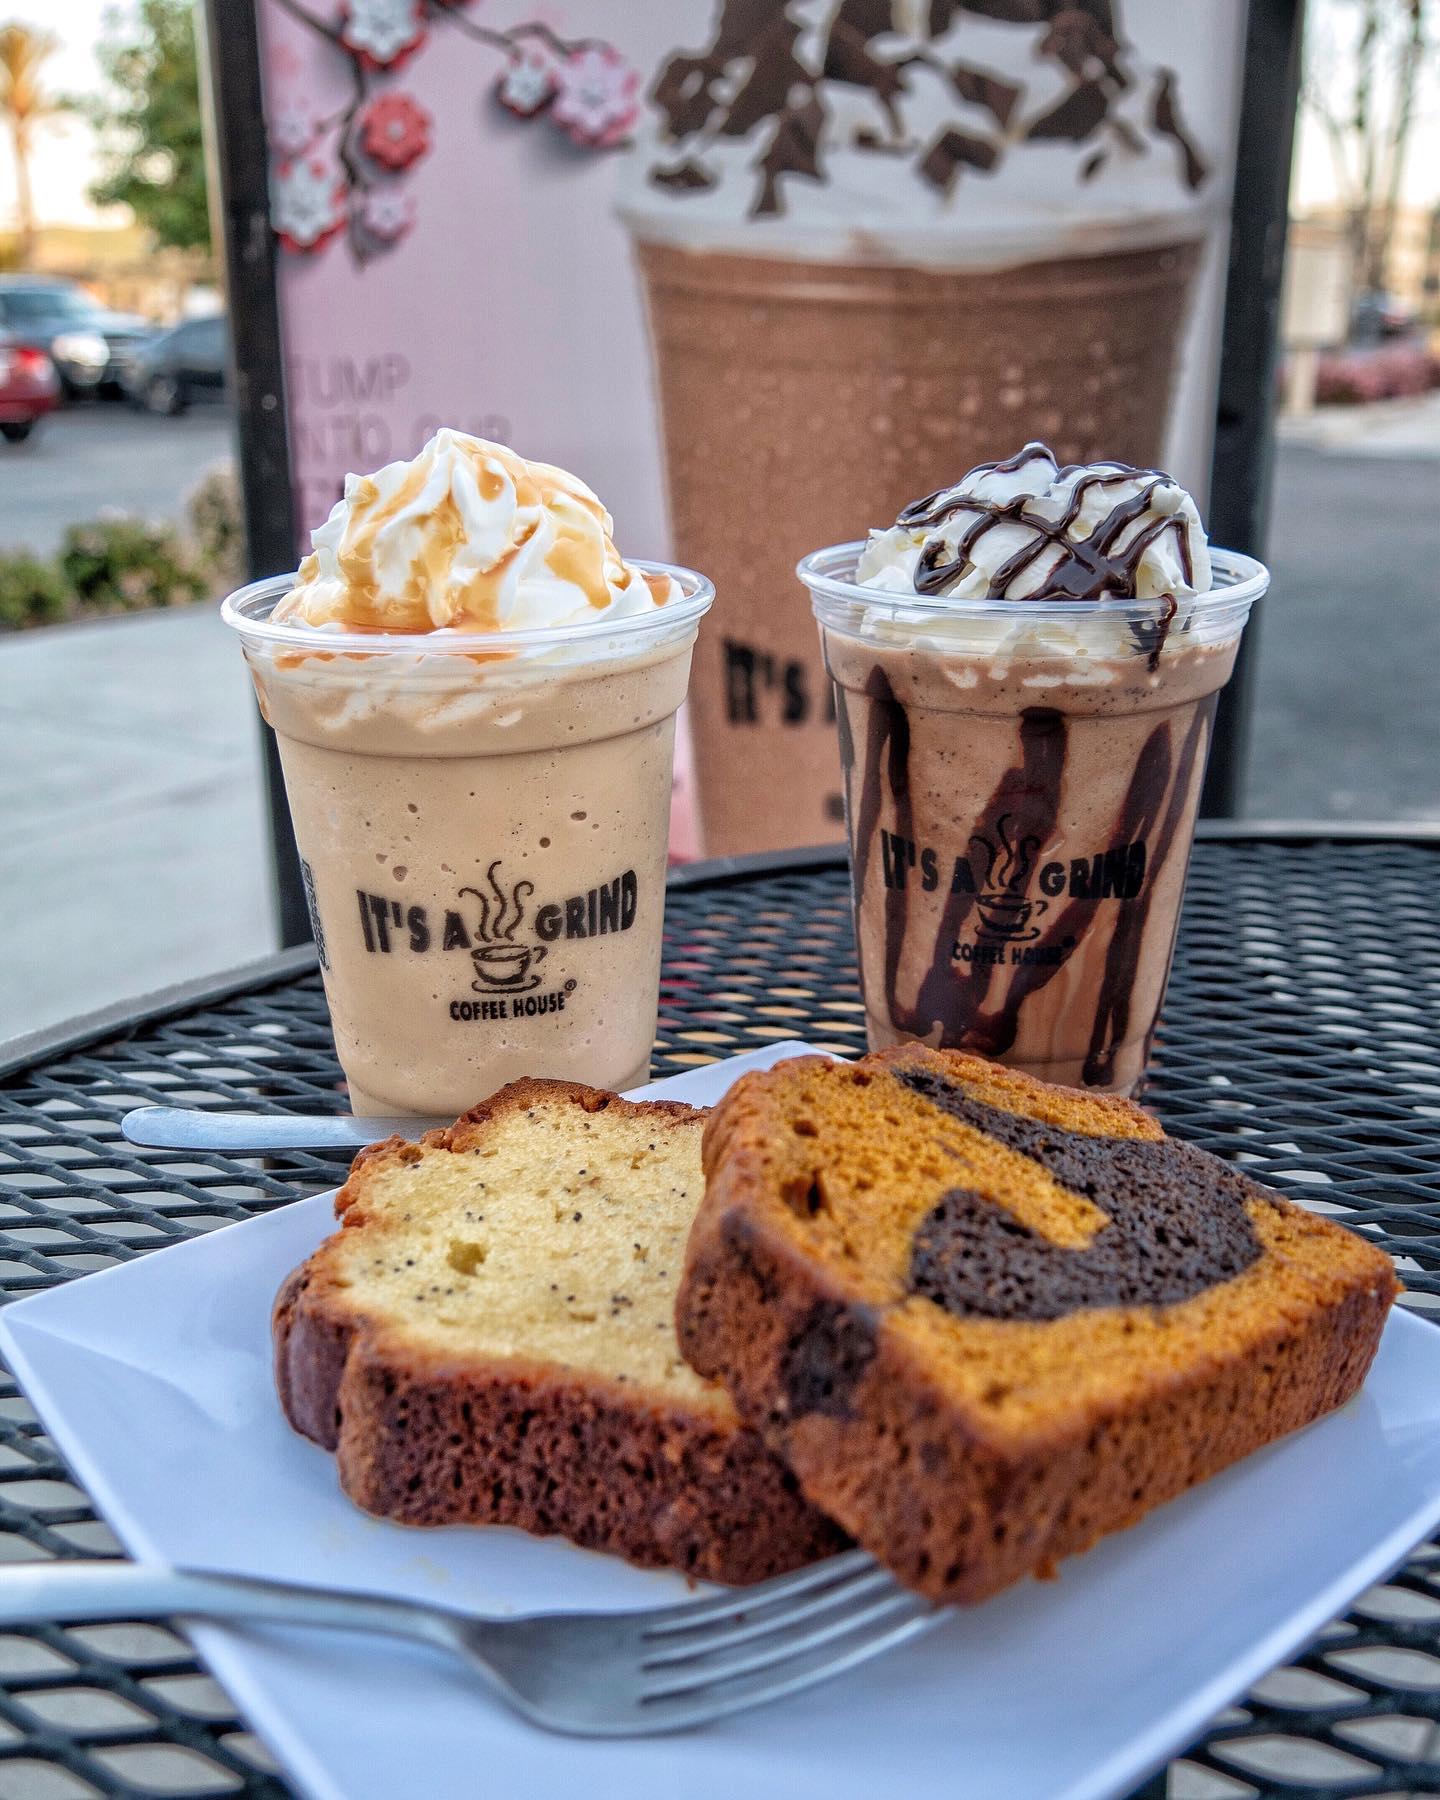 Its A Grind Coffee House – Corona, CA